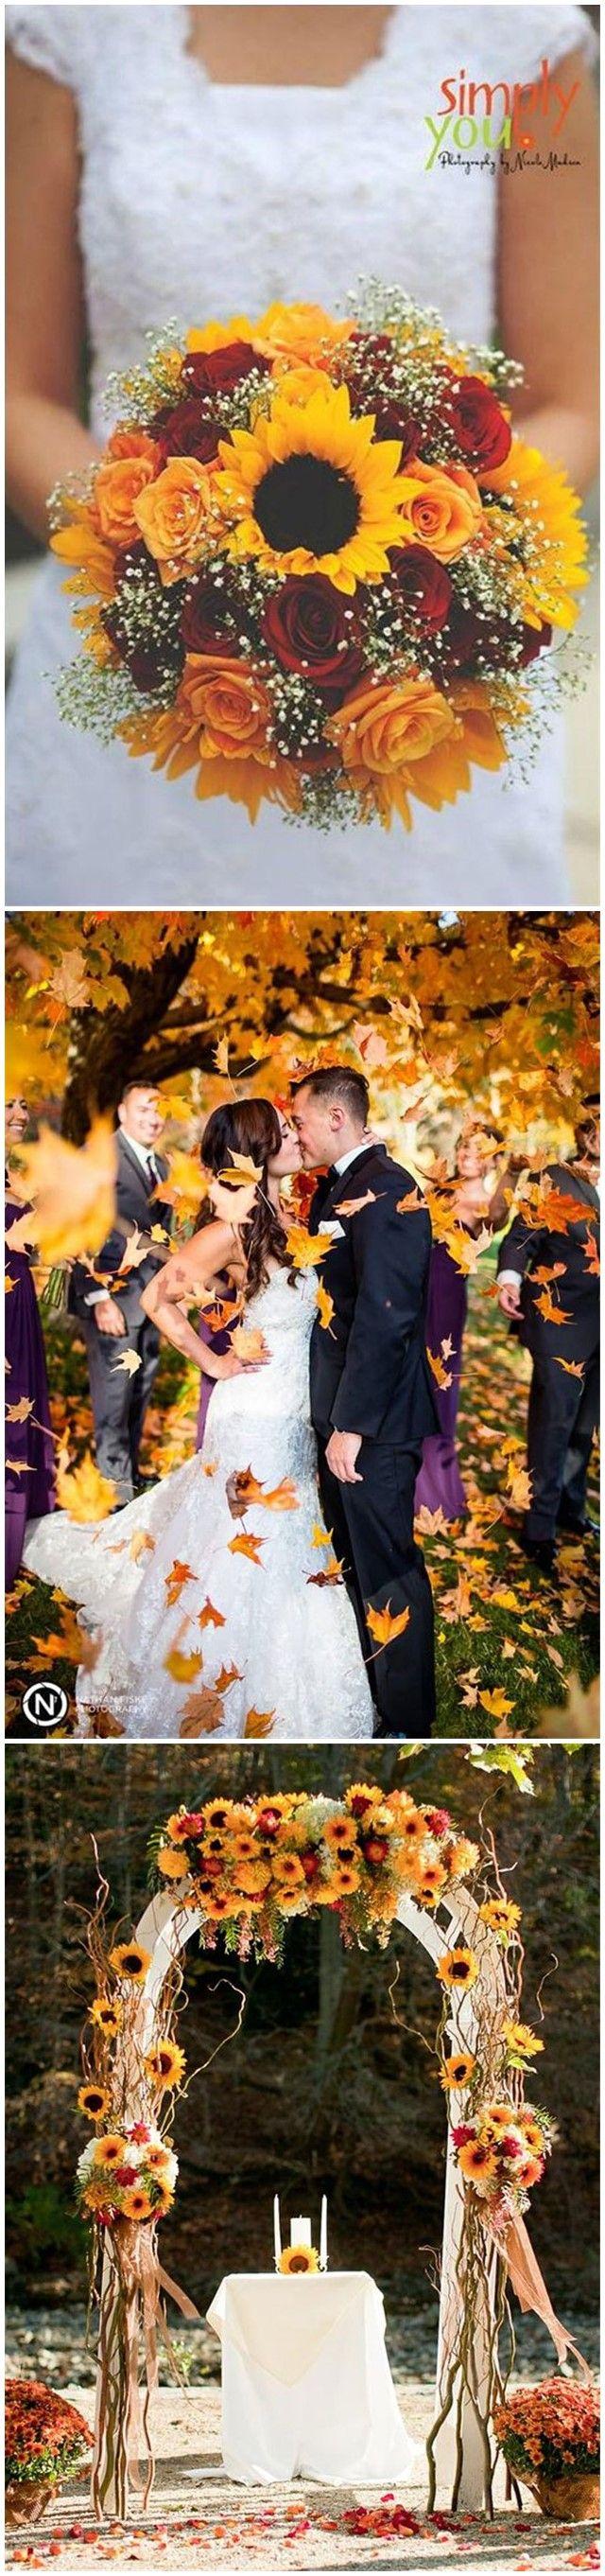 Wedding decorations venue october 2018  Best Fall Wedding Ideas in   Dreams Come True  Pinterest